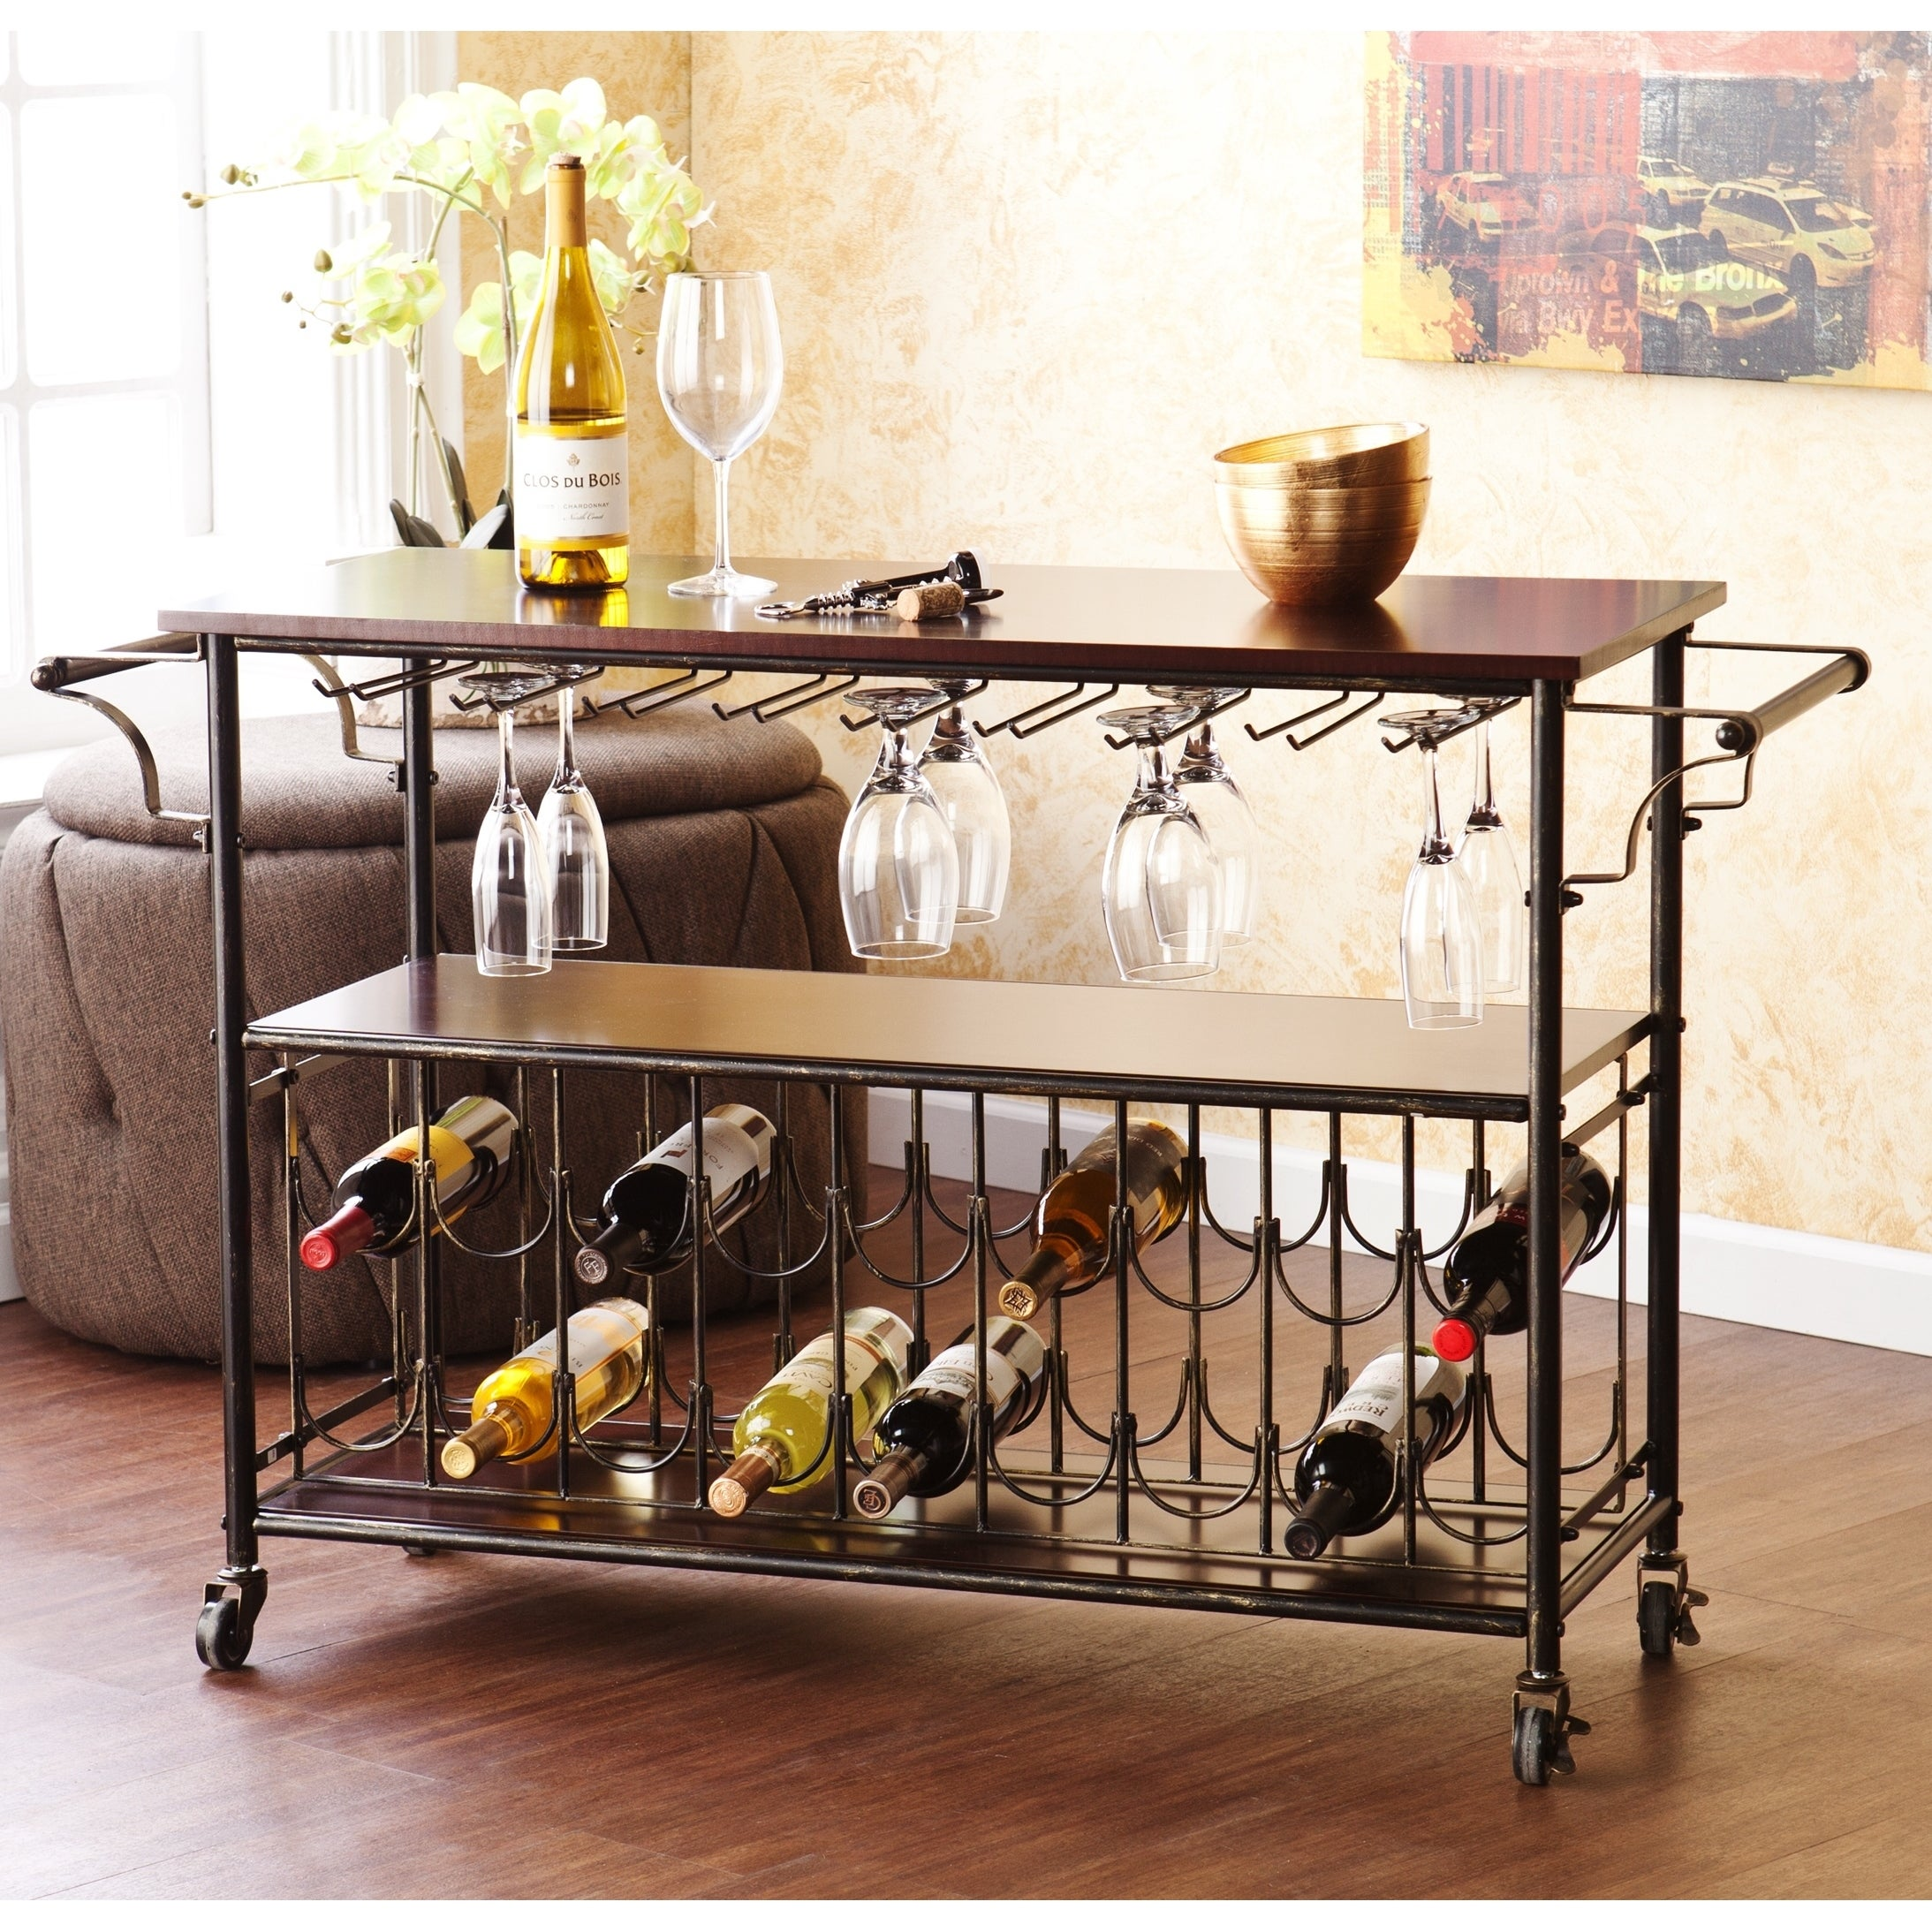 Carbon Loft Guppy Espresso/Black Wine Bar Cart Serving Table